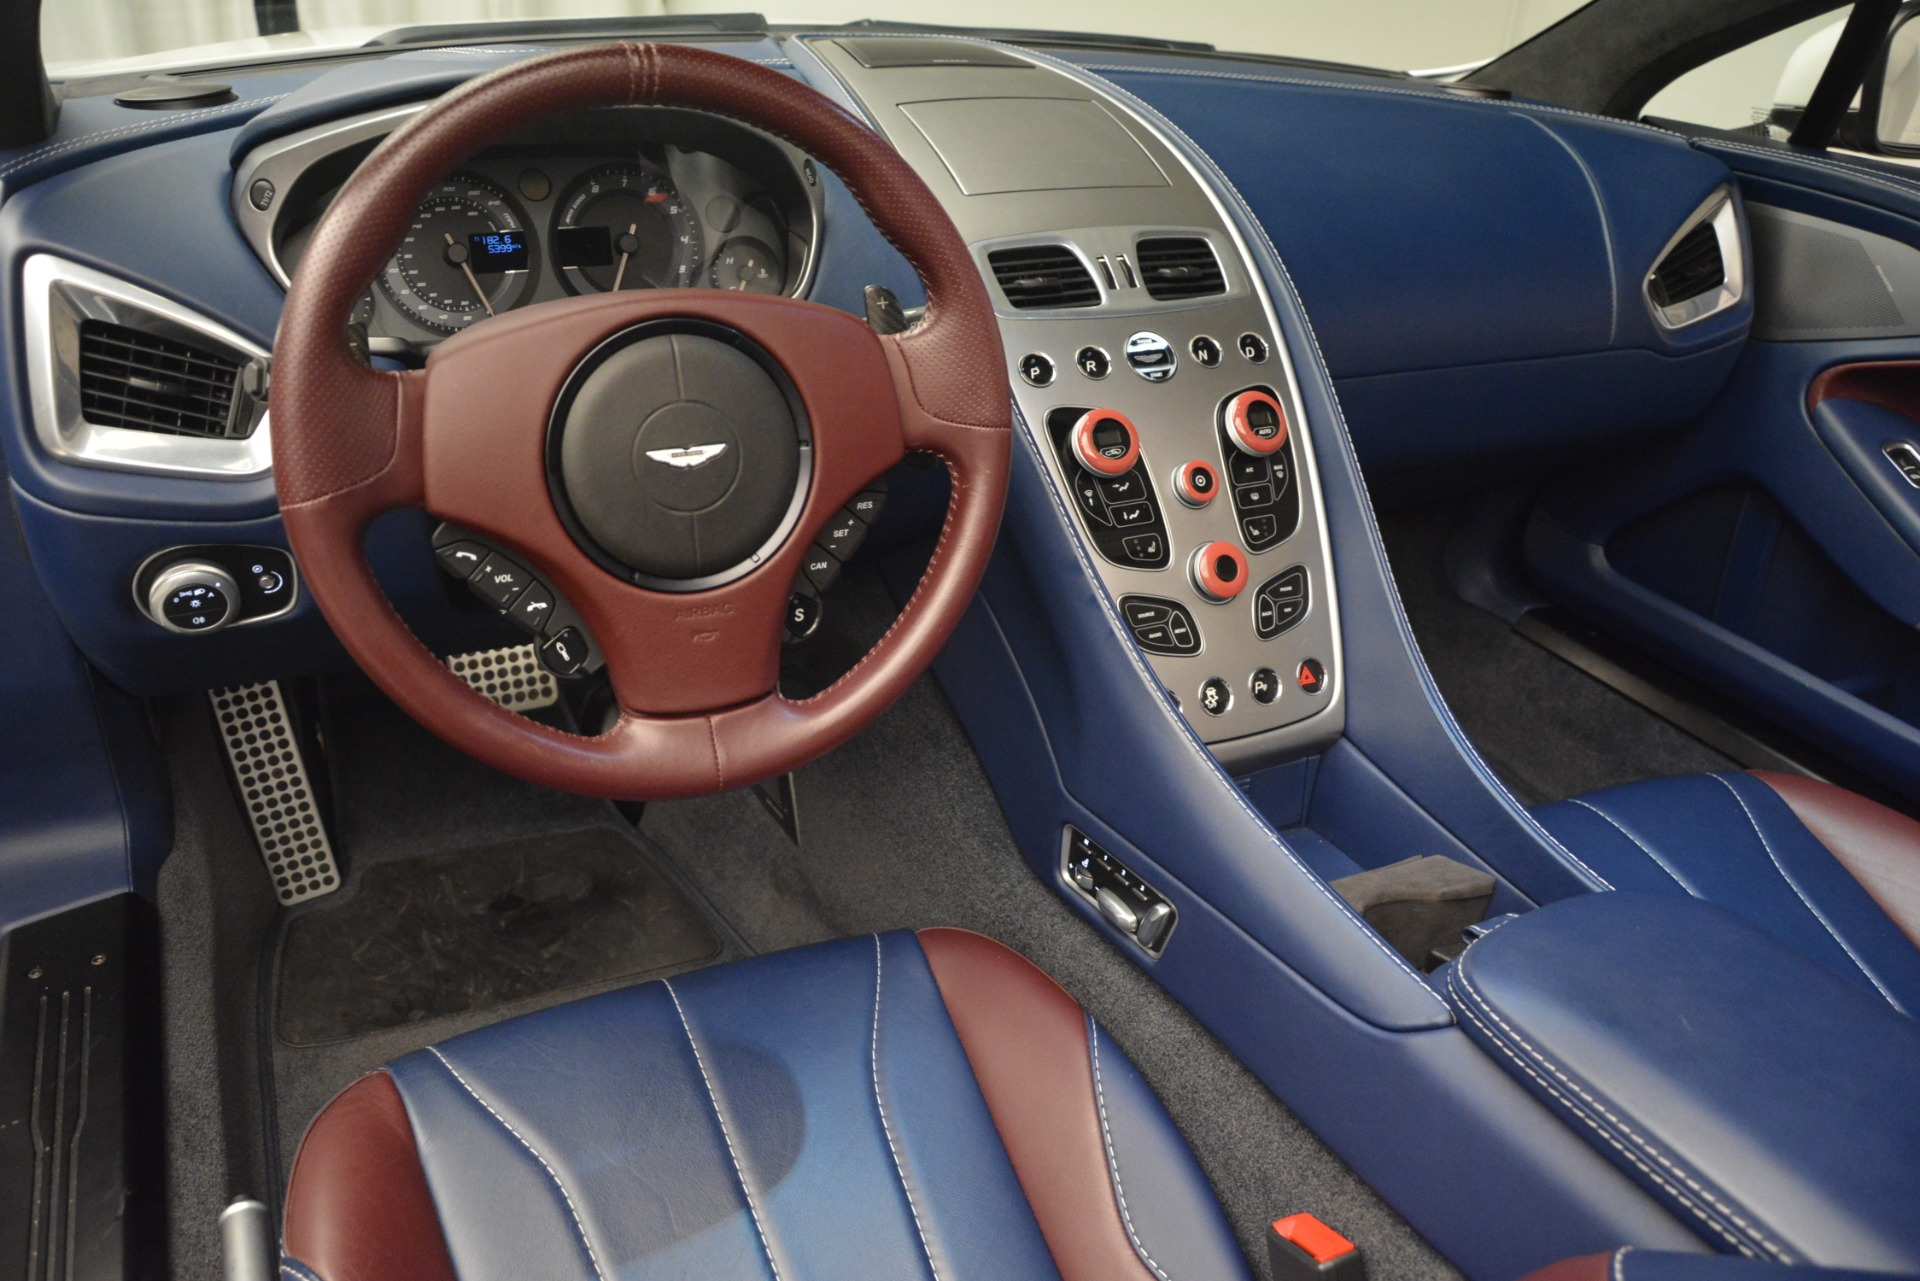 Used 2015 Aston Martin Vanquish Convertible For Sale In Greenwich, CT. Alfa Romeo of Greenwich, 7507 2982_p21